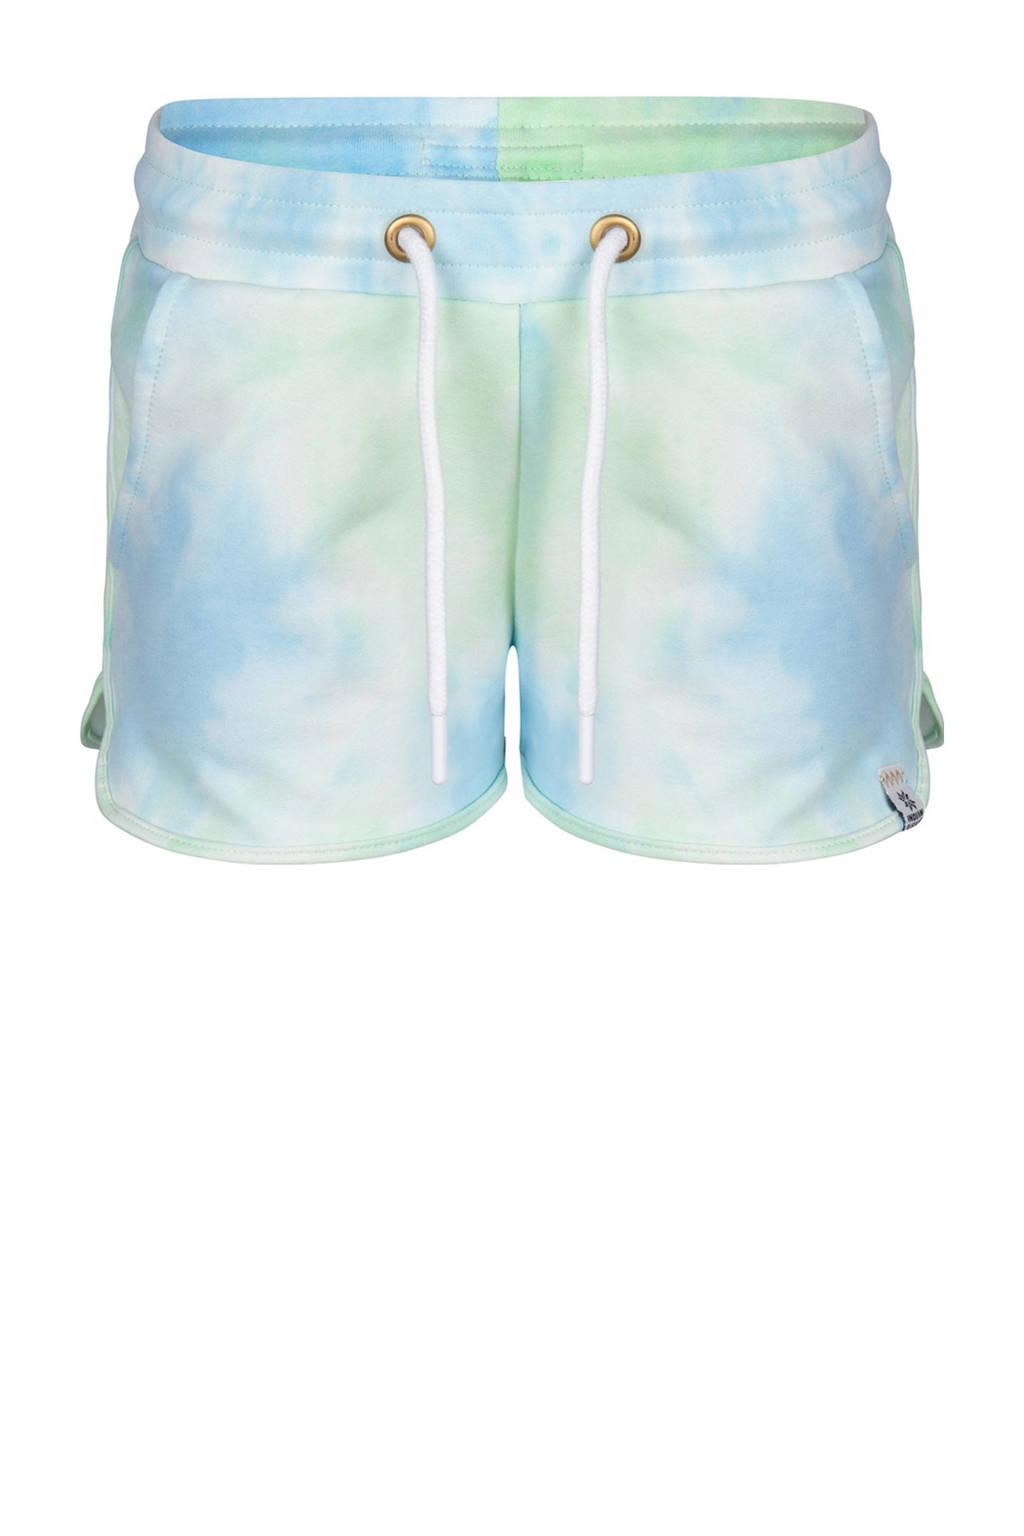 Indian Blue Jeans tie-dyeregular fit short mintgroen/lichtblauw